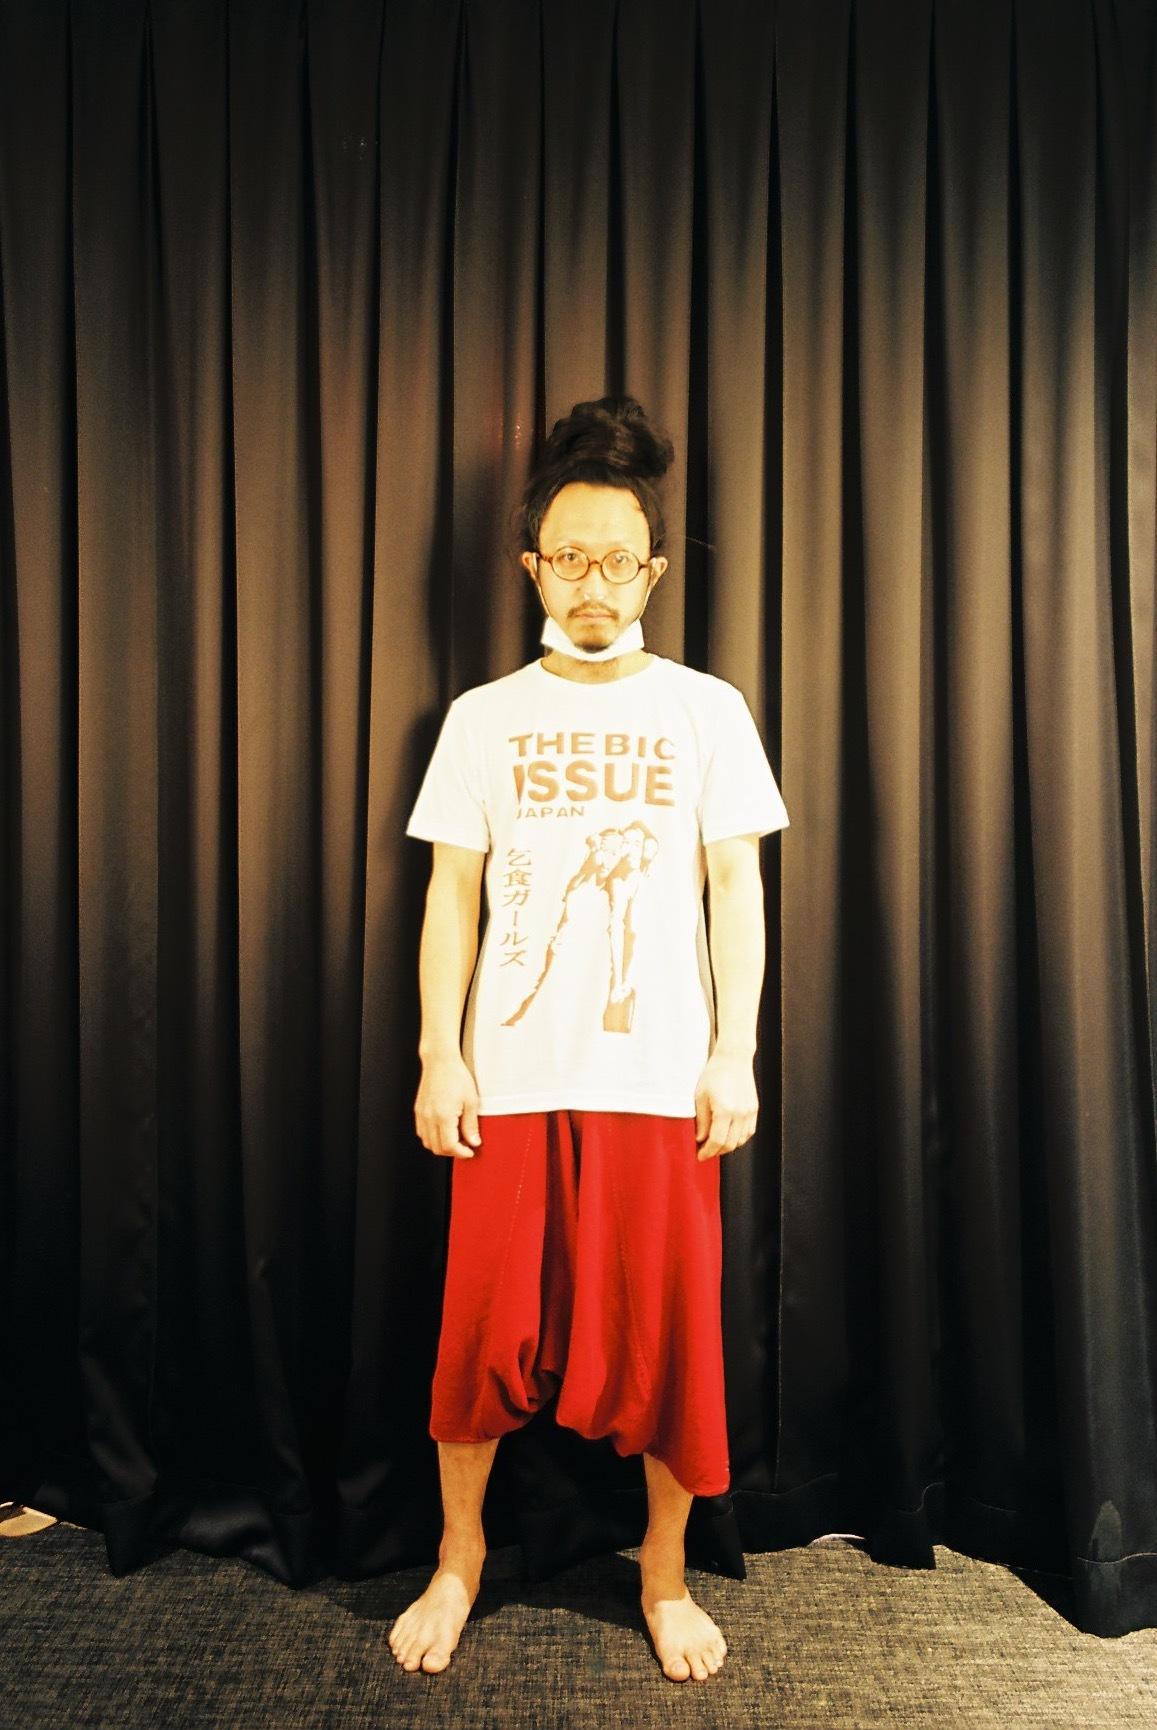 BIC ISSUE Tシャツ_c0195272_21531099.jpg